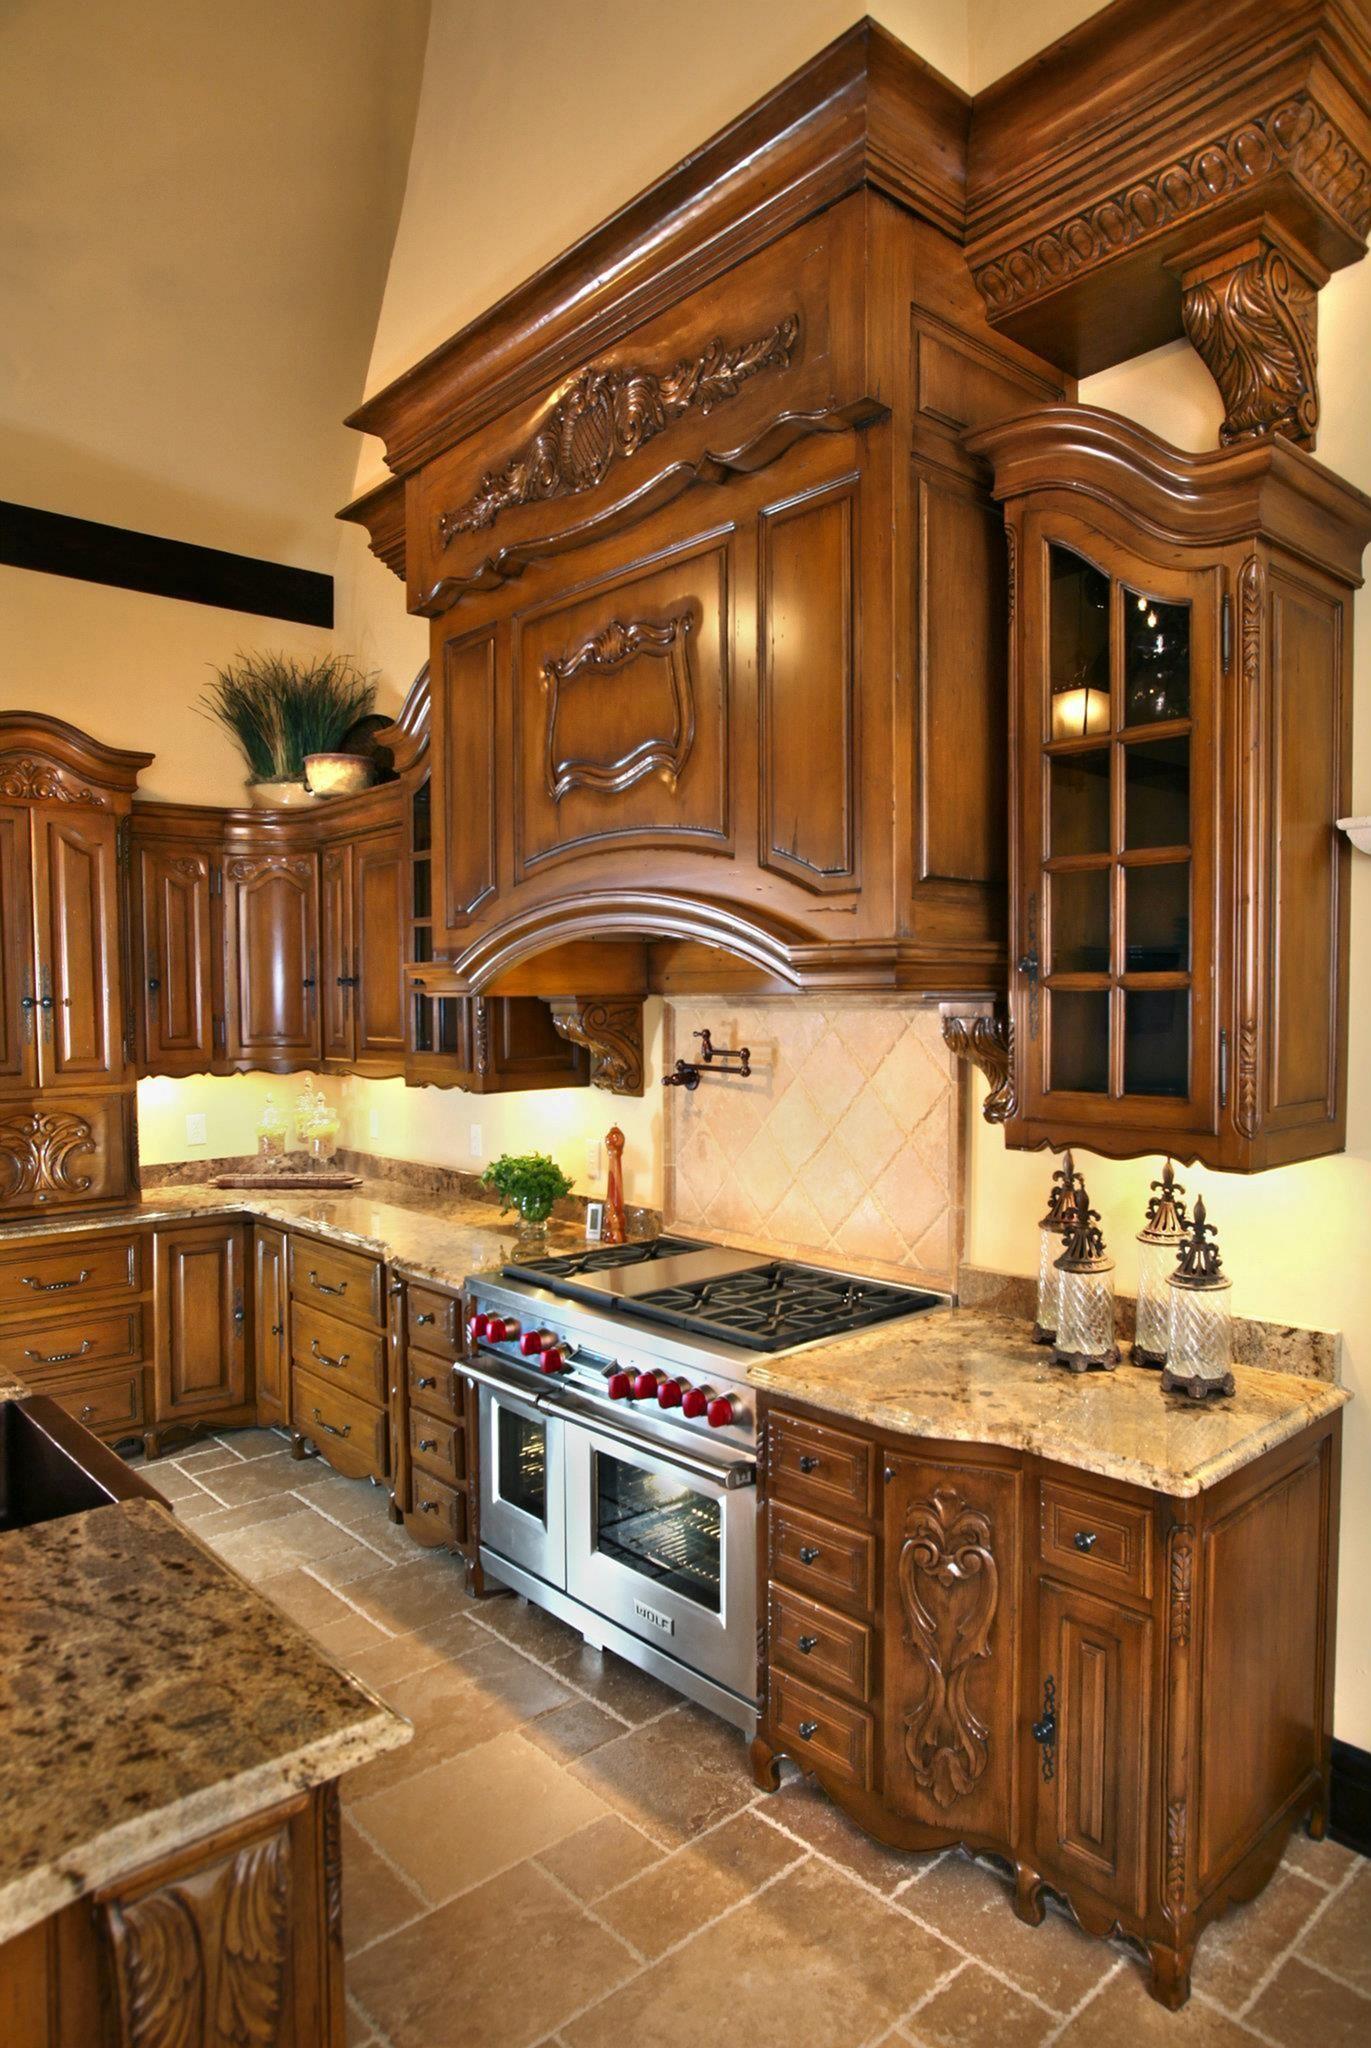 30 gorgeous tuscan kitchen design ideas you must know rustic kitchen tuscan kitchen design on kitchen remodel kitchen designs id=61917